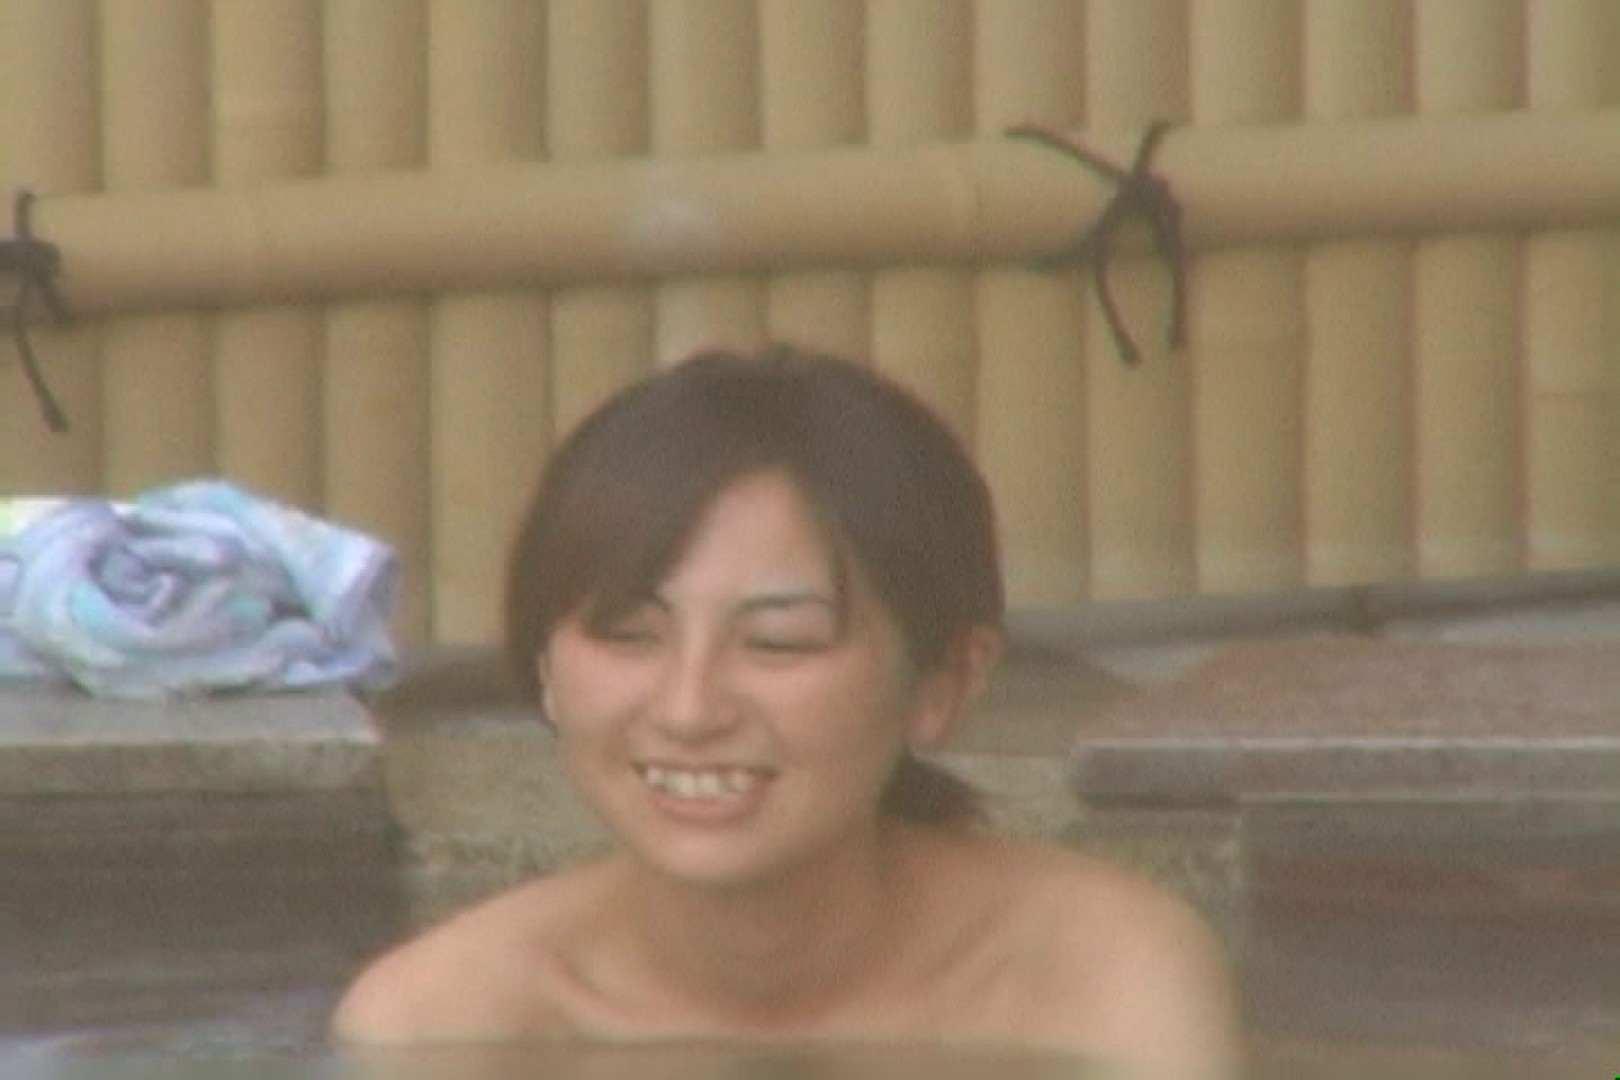 Aquaな露天風呂Vol.26【VIP】 OLセックス 盗み撮りオマンコ動画キャプチャ 59画像 29